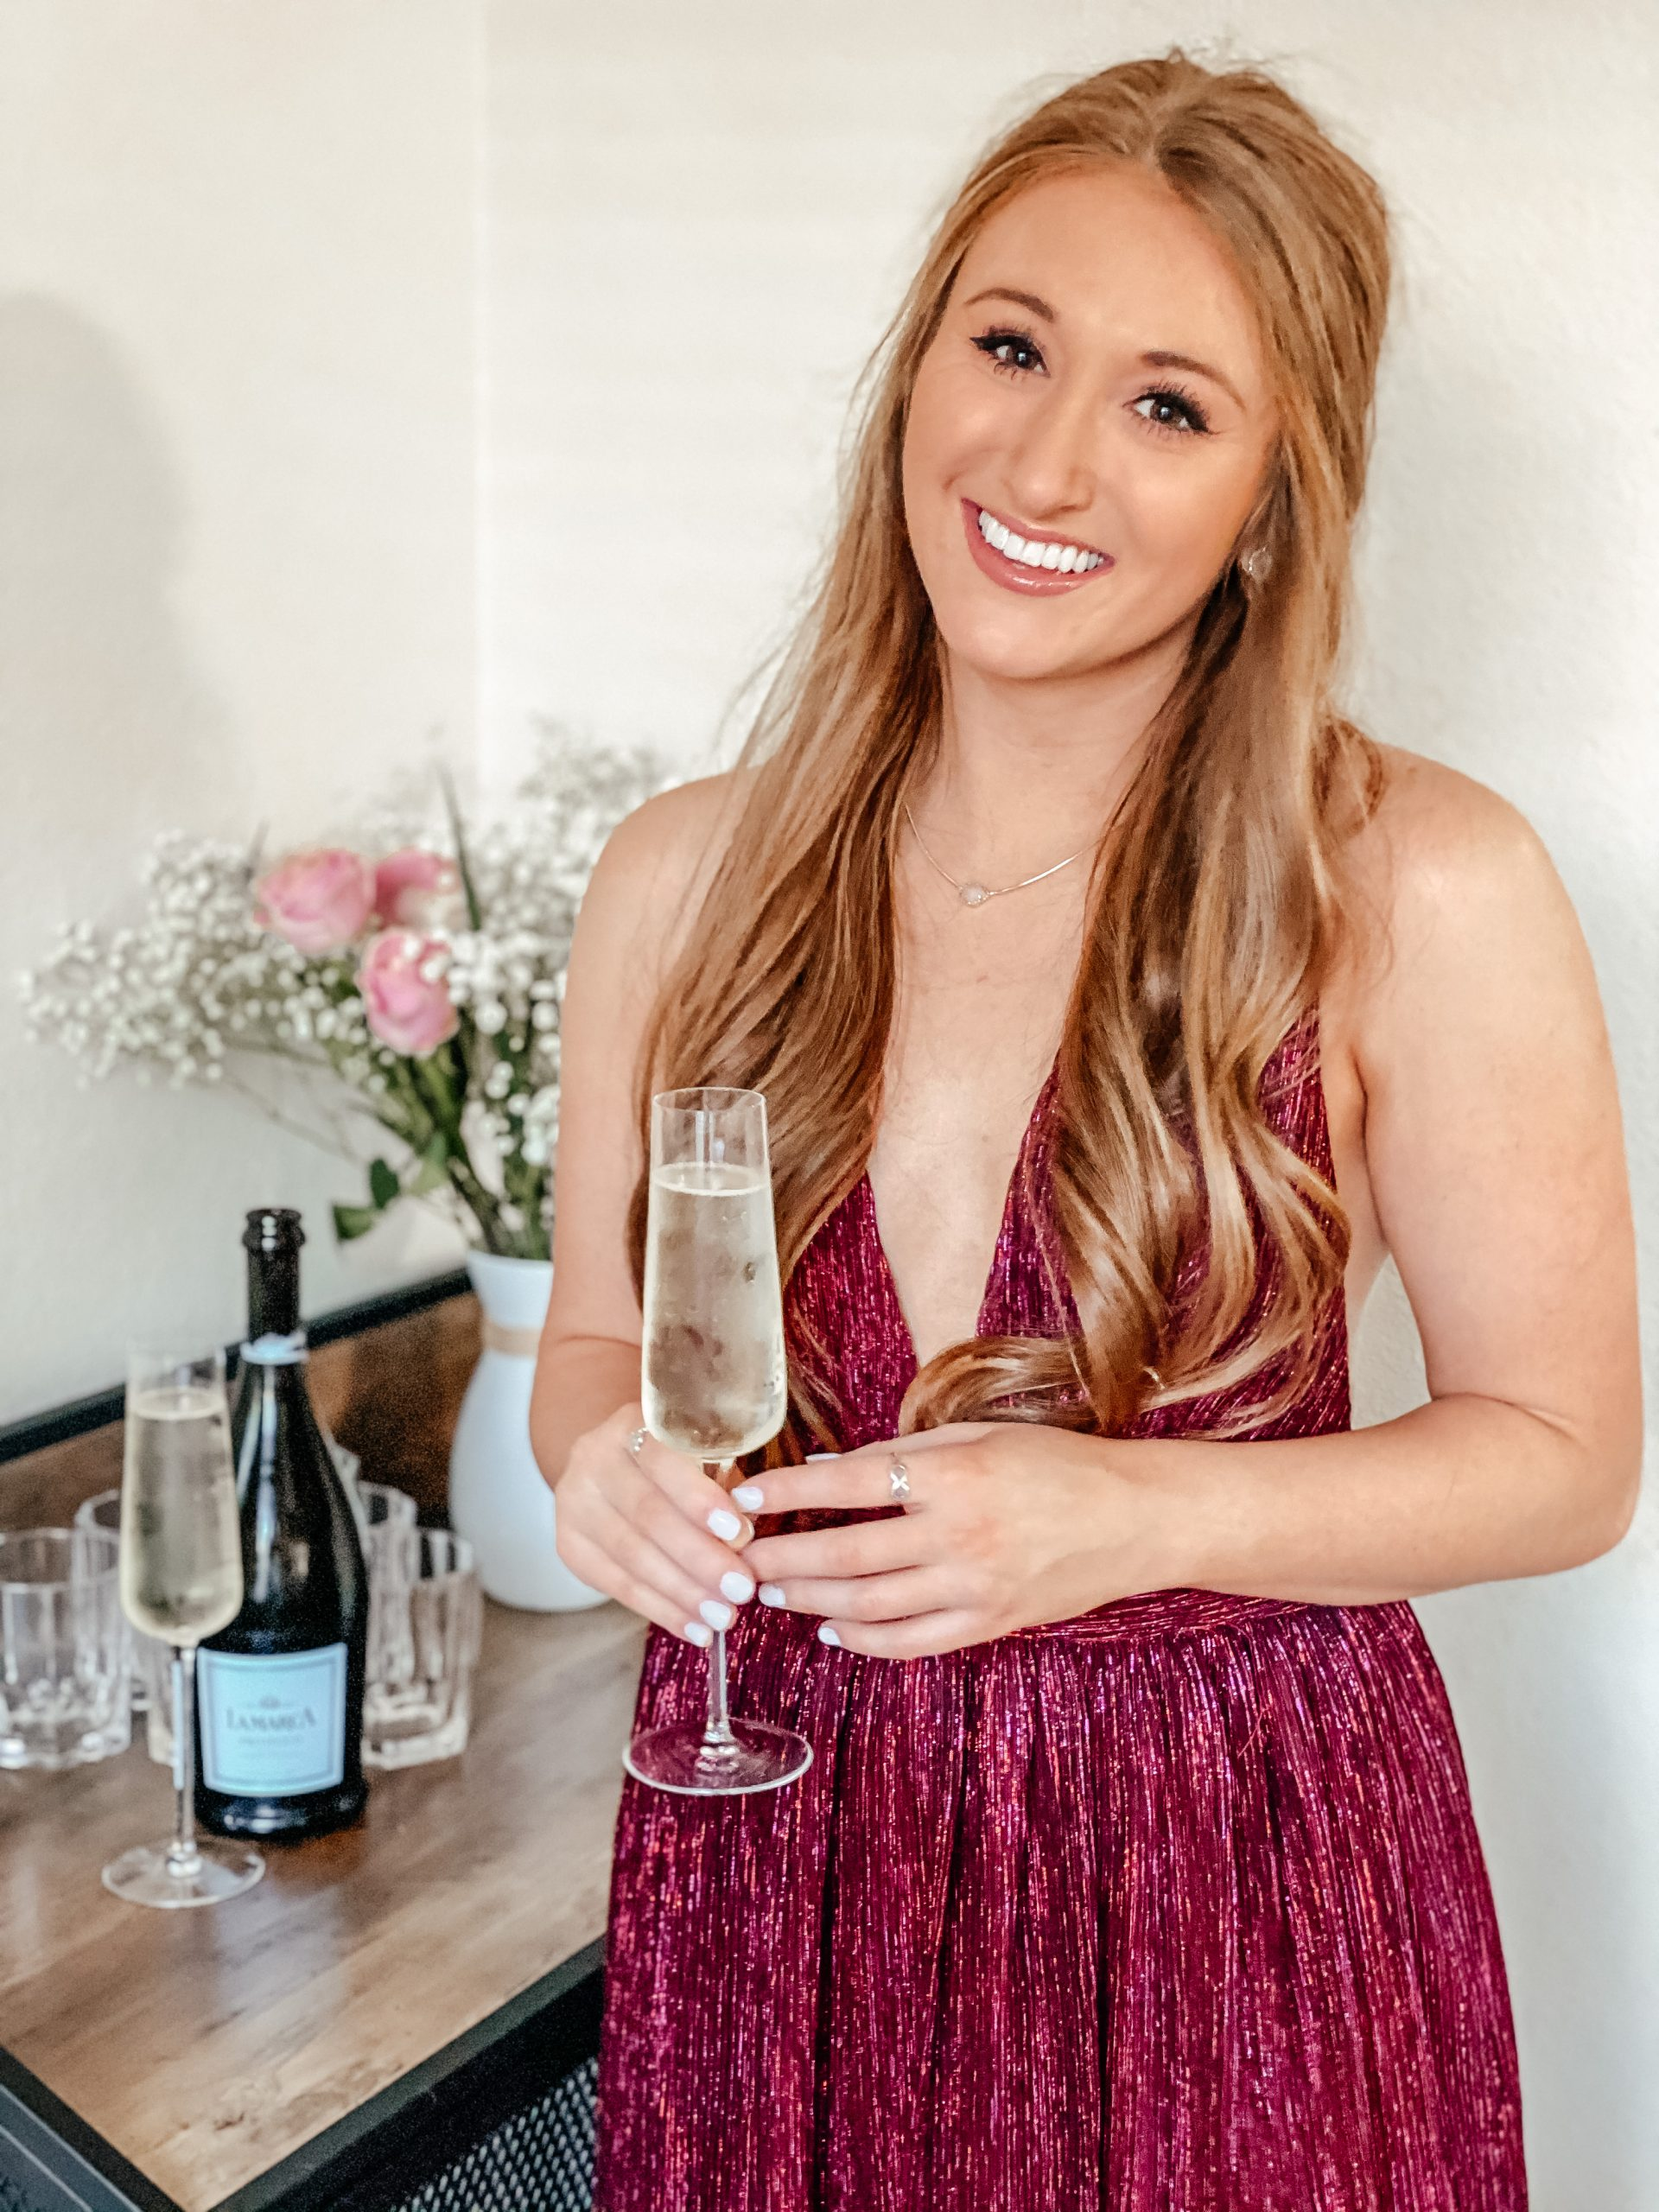 Pouring champagne prosecco for Valentine's Day and wearing a dress for Valentine's Day from Nordstrom